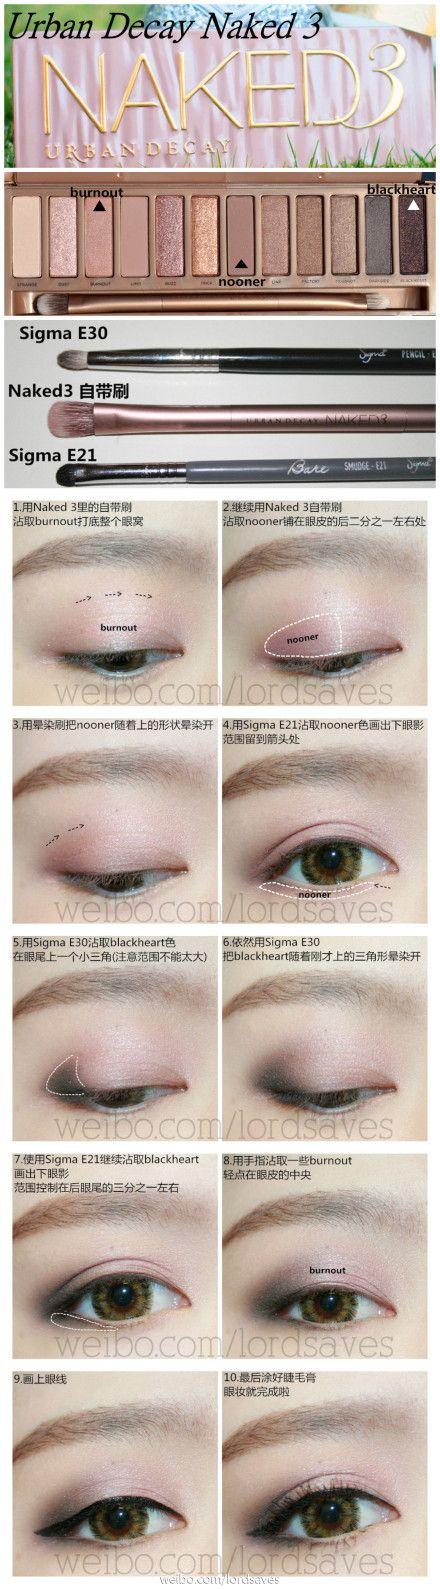 Urban decay make up tips | 眼妆##UD Naked 3#前几天又画了一次UD的粉... 来自lordsavesG - 微博